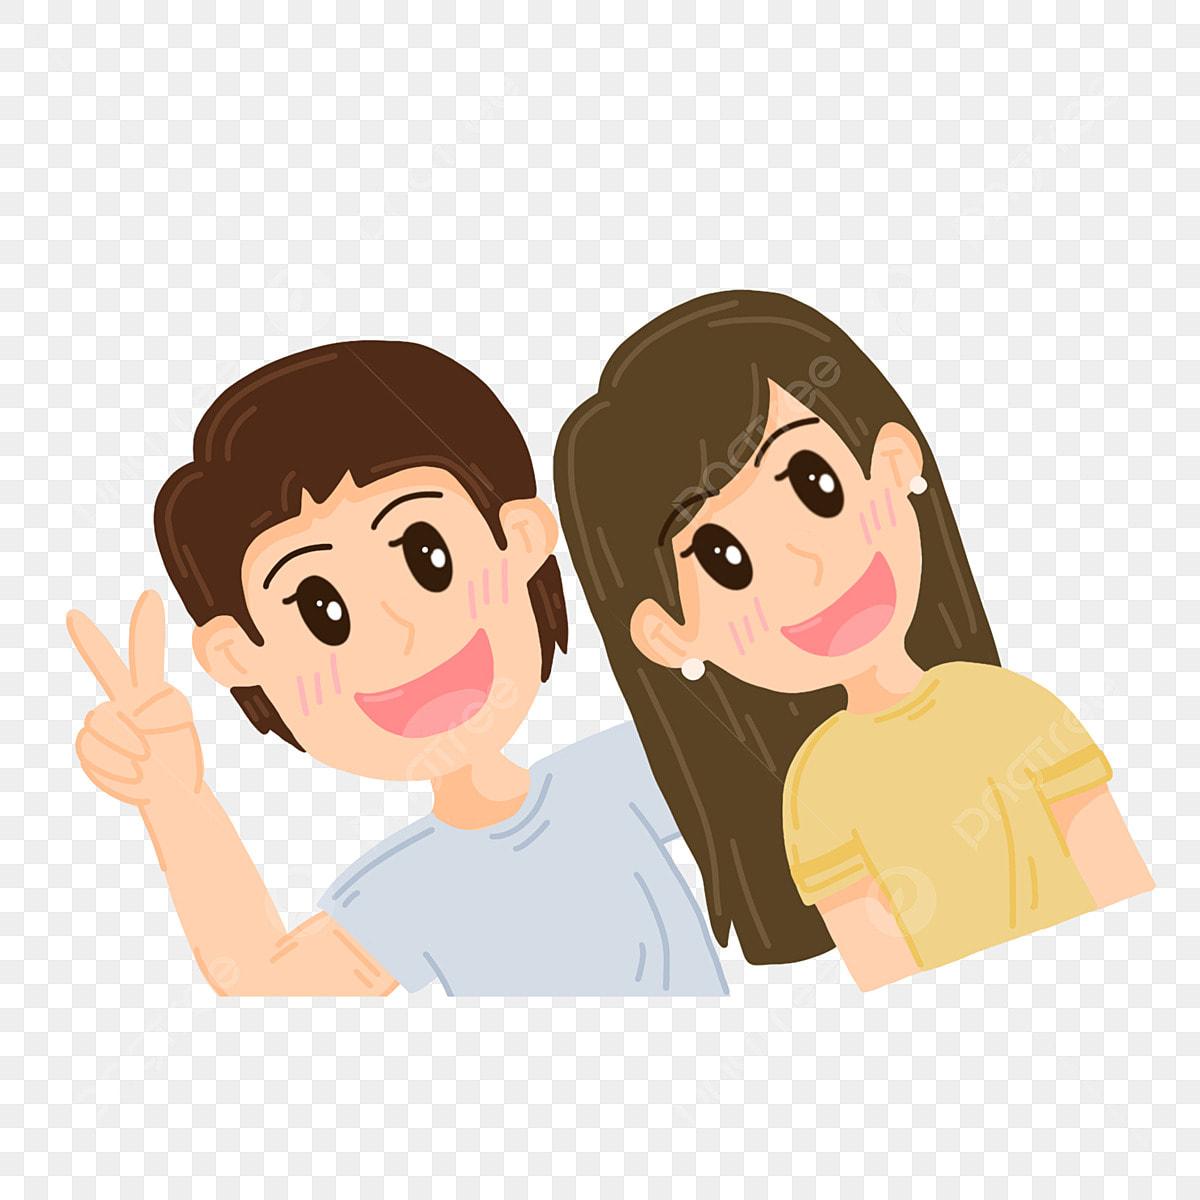 Pasangan Kartun Lucu Gembira Mengambil Gambar Fotografi